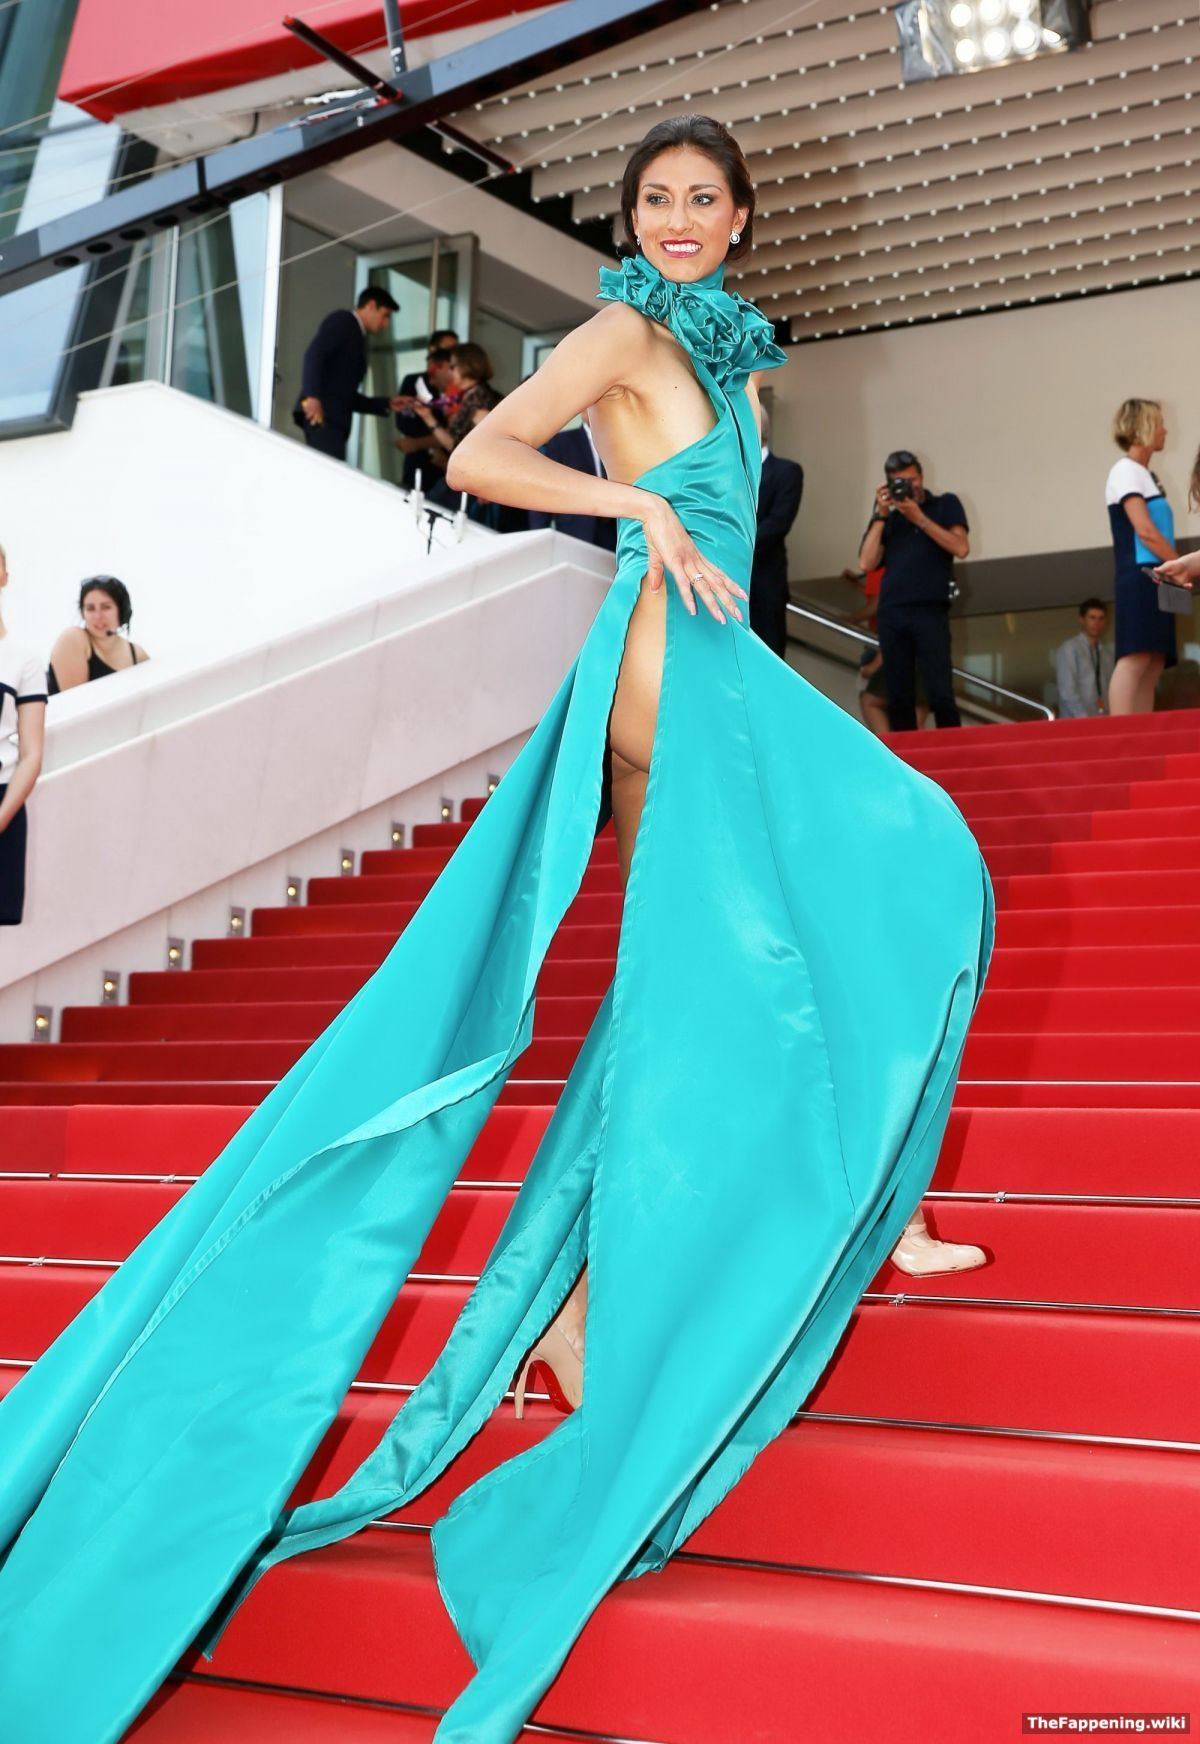 Zsuzsa Csisztu Nude Celebs Forum,Daisy Lea Topless - 7 Photos Erotic nude Terry Richardson Fappening,Connie Nielsen: Upskirt Classic. 2018-2019 celebrityes photos leaks!